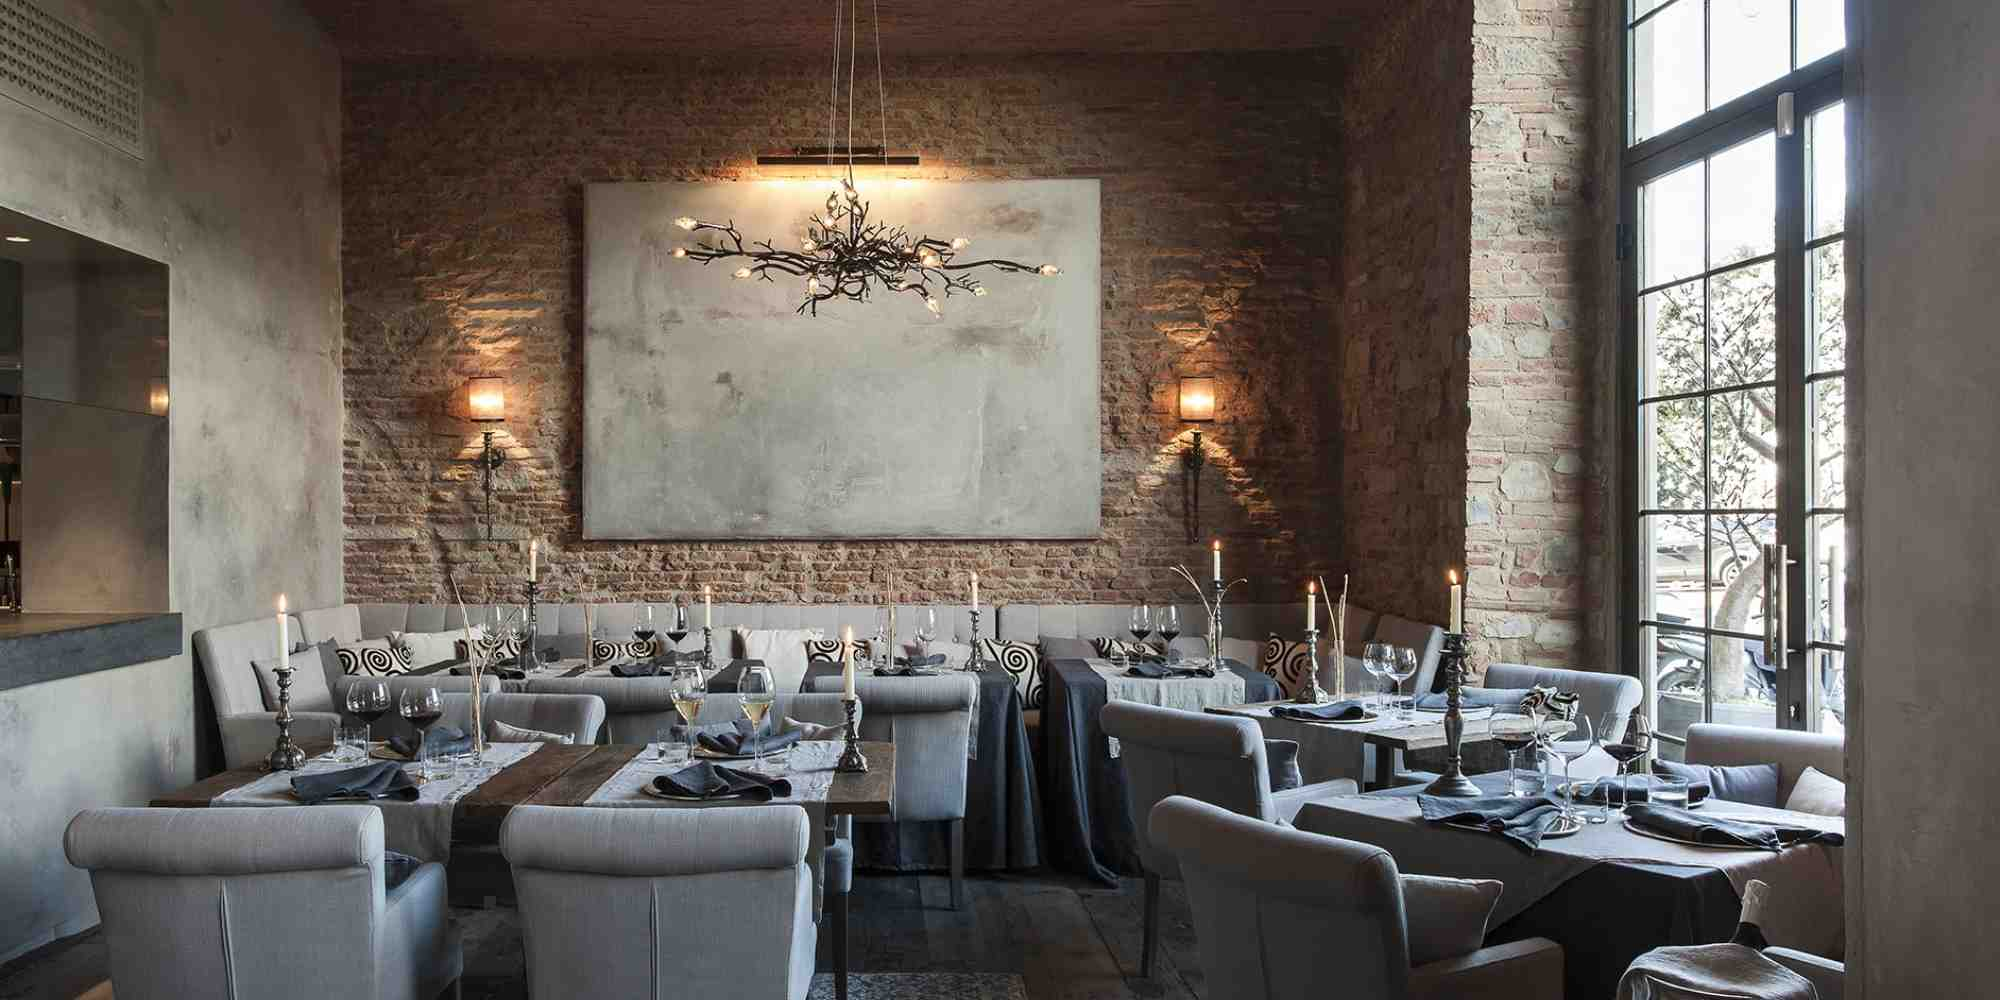 Restaurant 233 Toil 233 Florence La Bottega Del Buon Caf 233